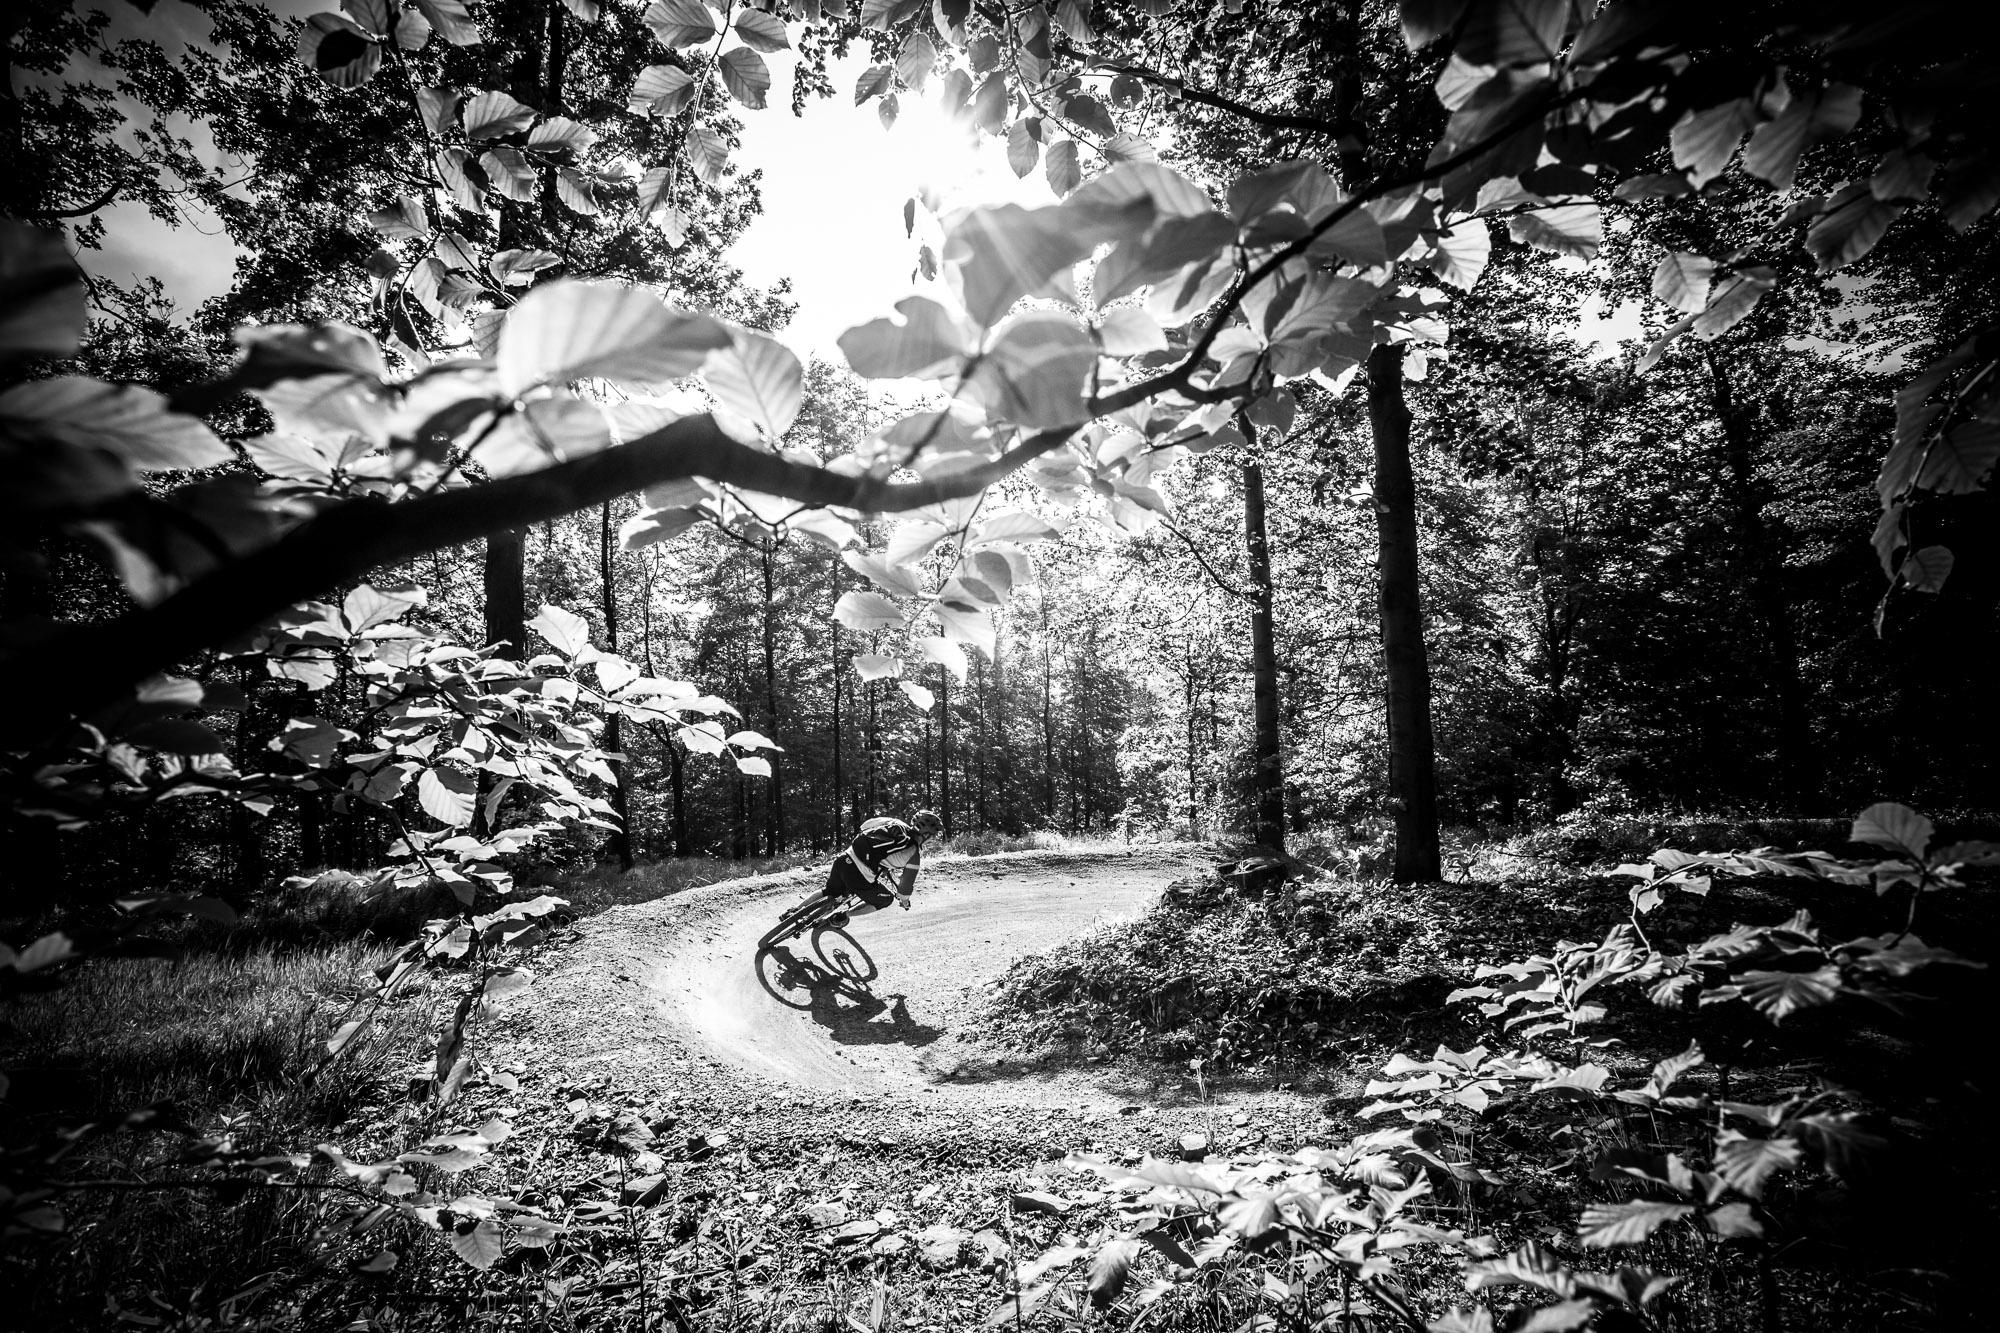 Justa-Jeskova-biking-in-Poland-JJ055306.jpg